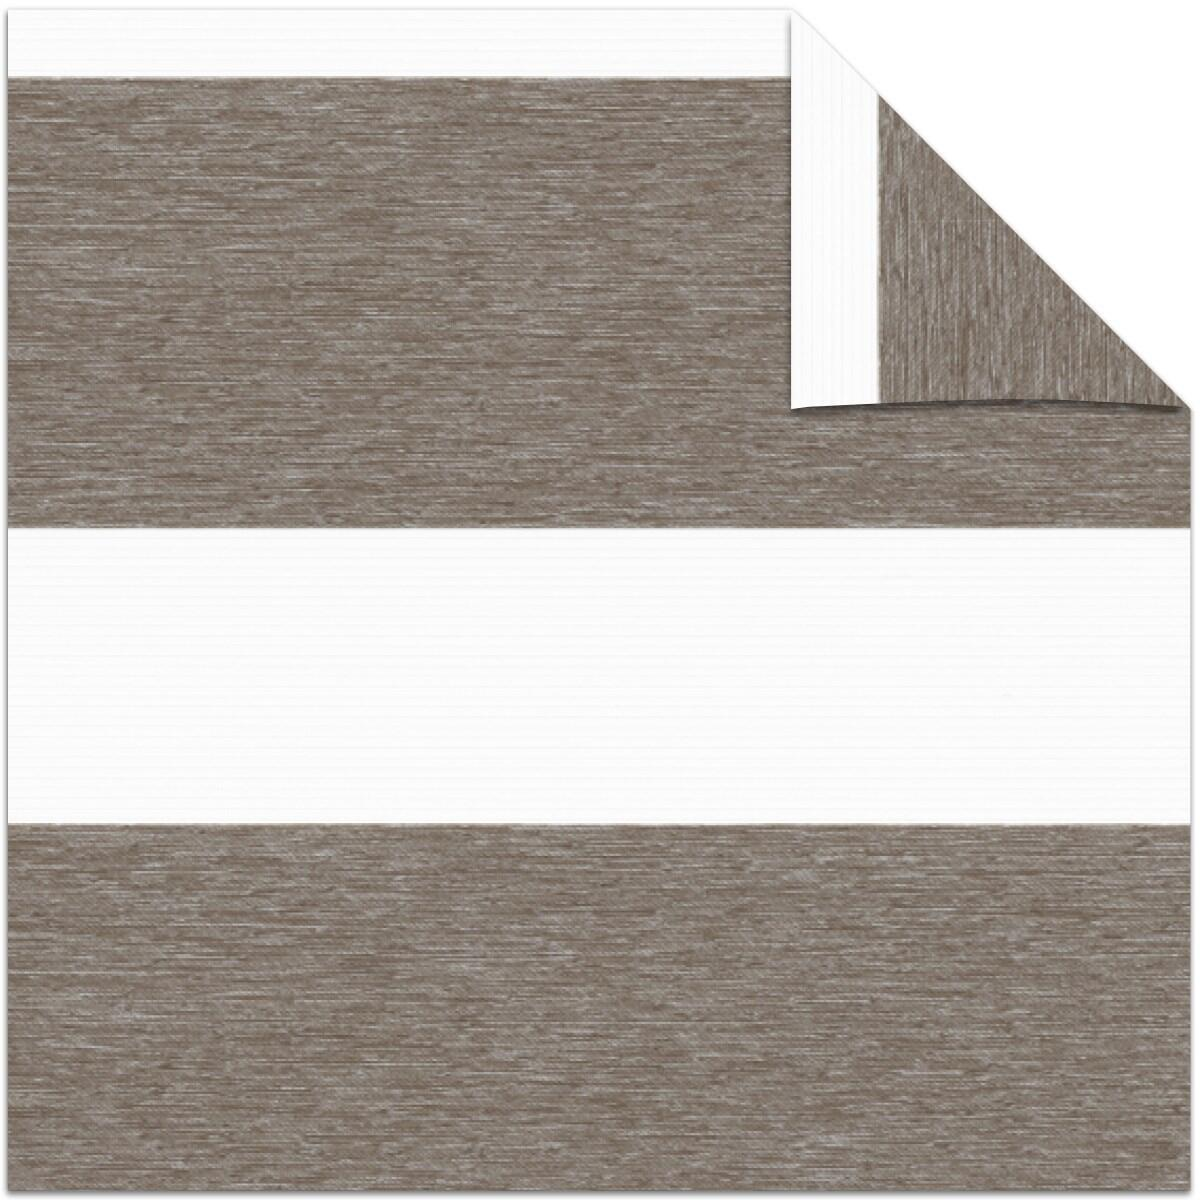 Tenda a rullo Orleans marrone 80 x 190 cm - 4